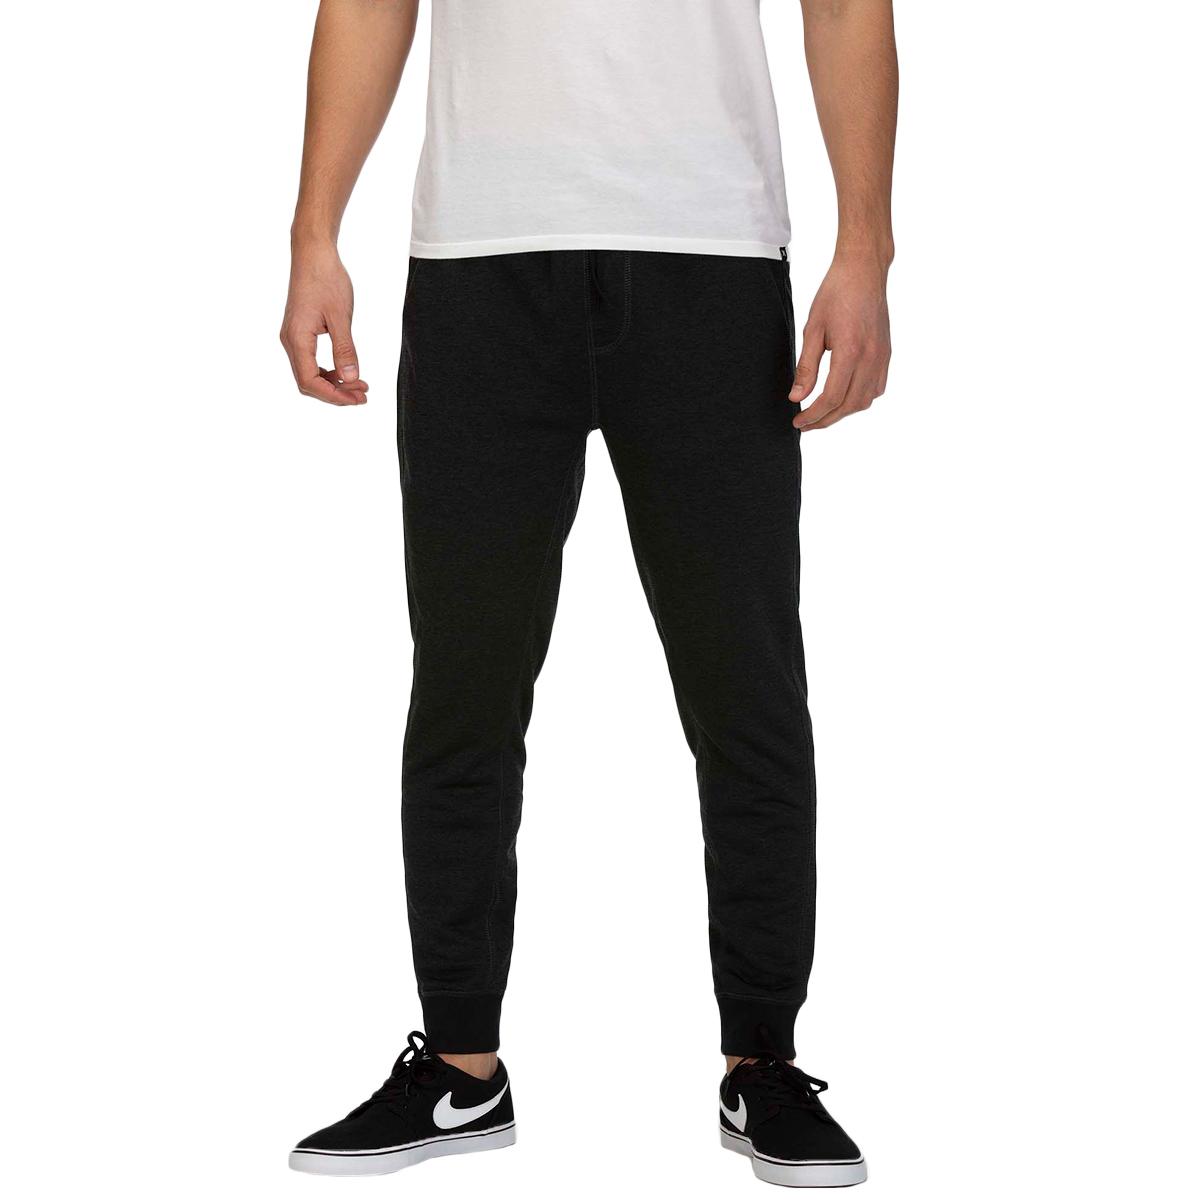 Hurley Men's Disperse Pant - Black, XL